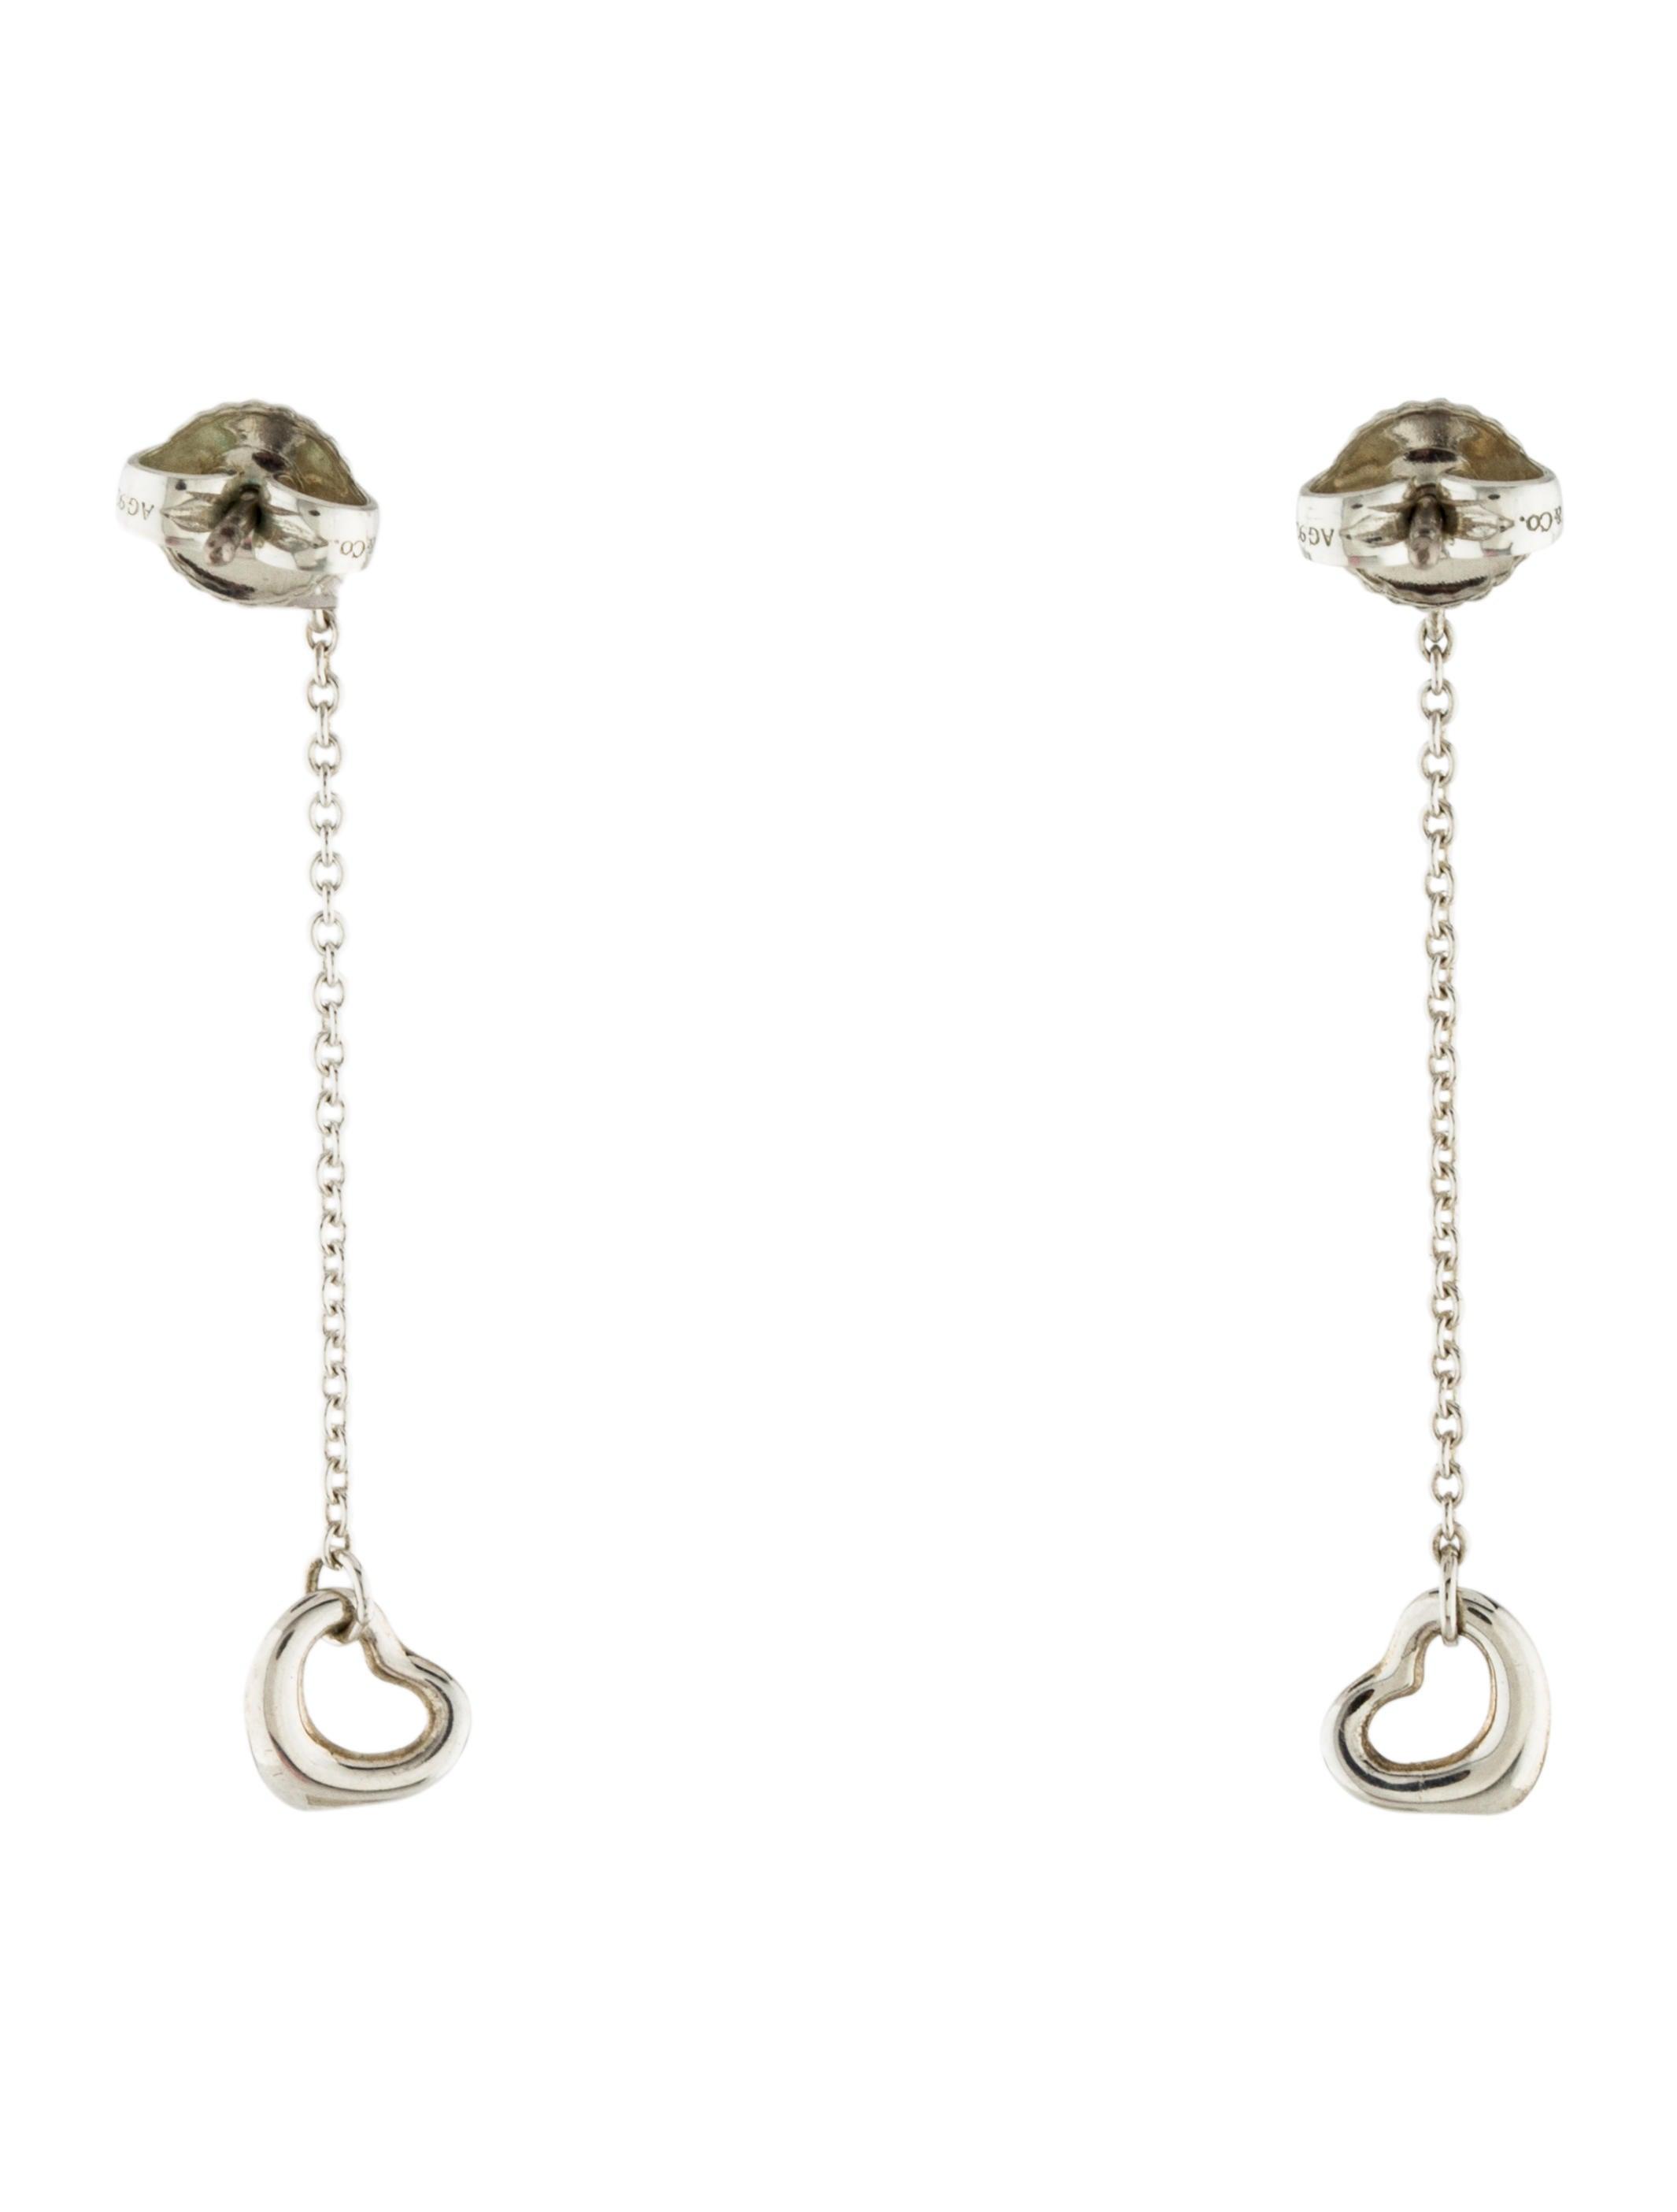 Tiffany co diamonds by the yard open heart earrings for Diamonds by the yard ring